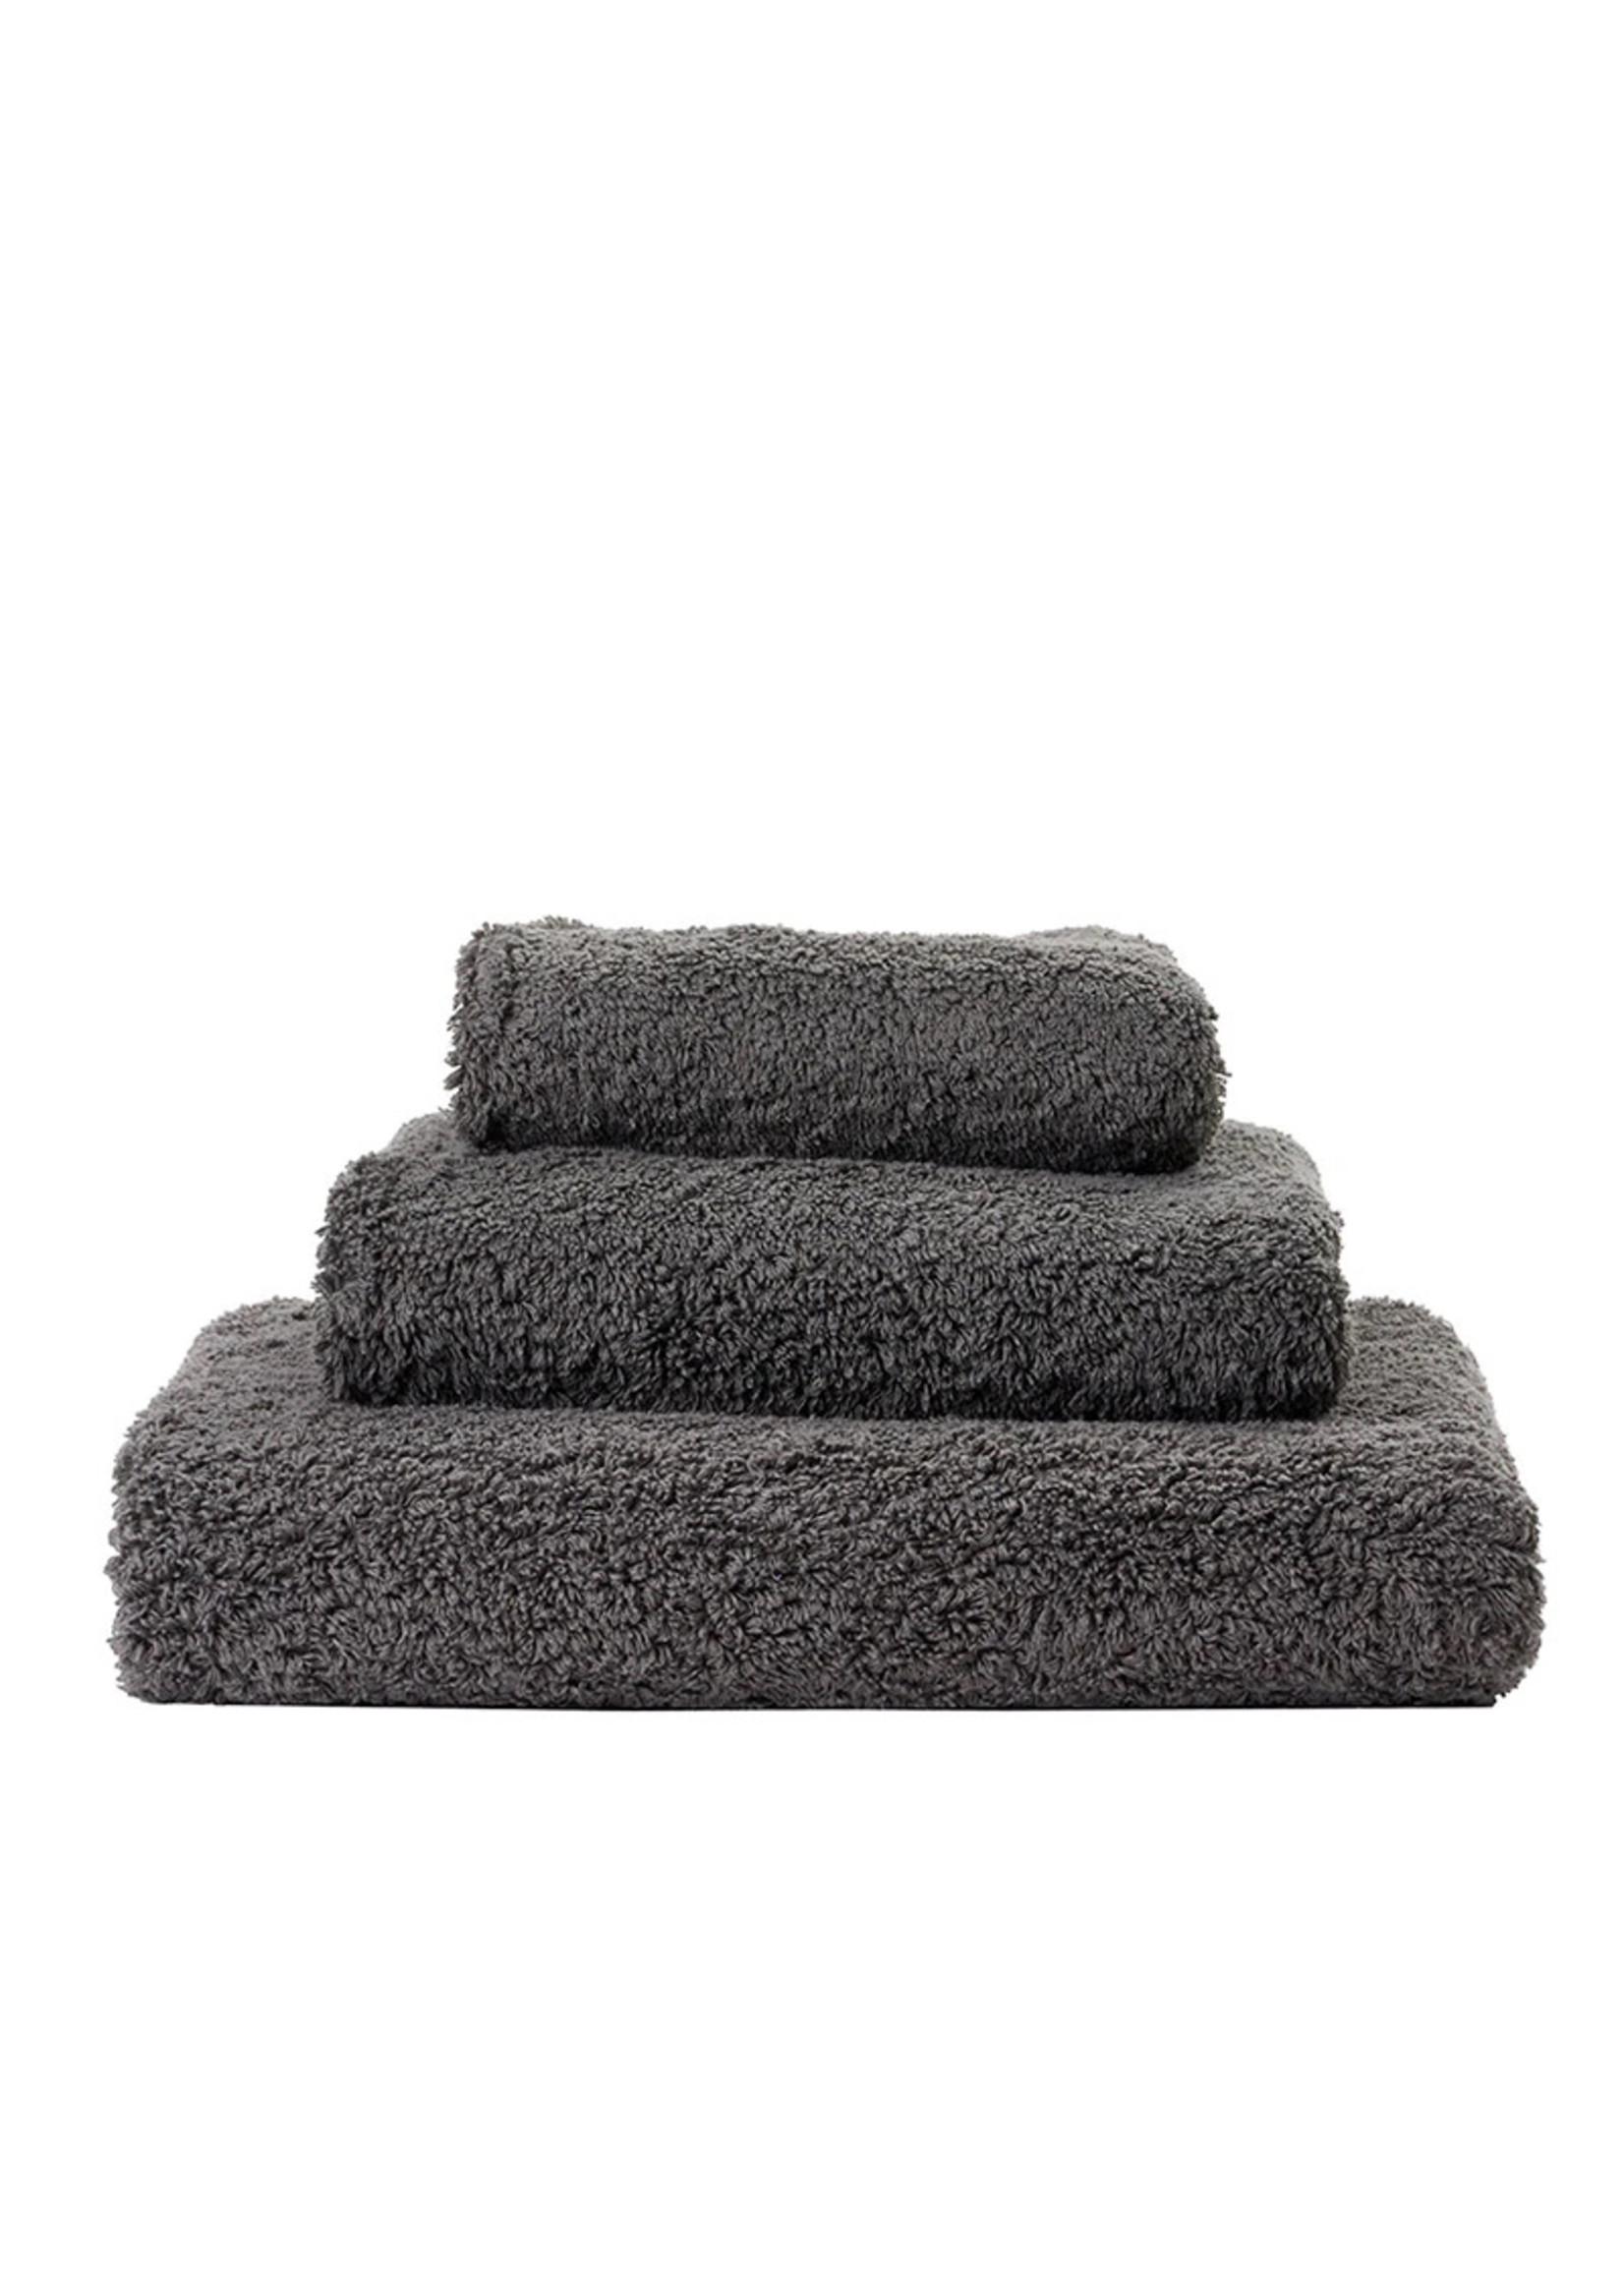 Abyss & Habidecor Super Pile Gris Towels